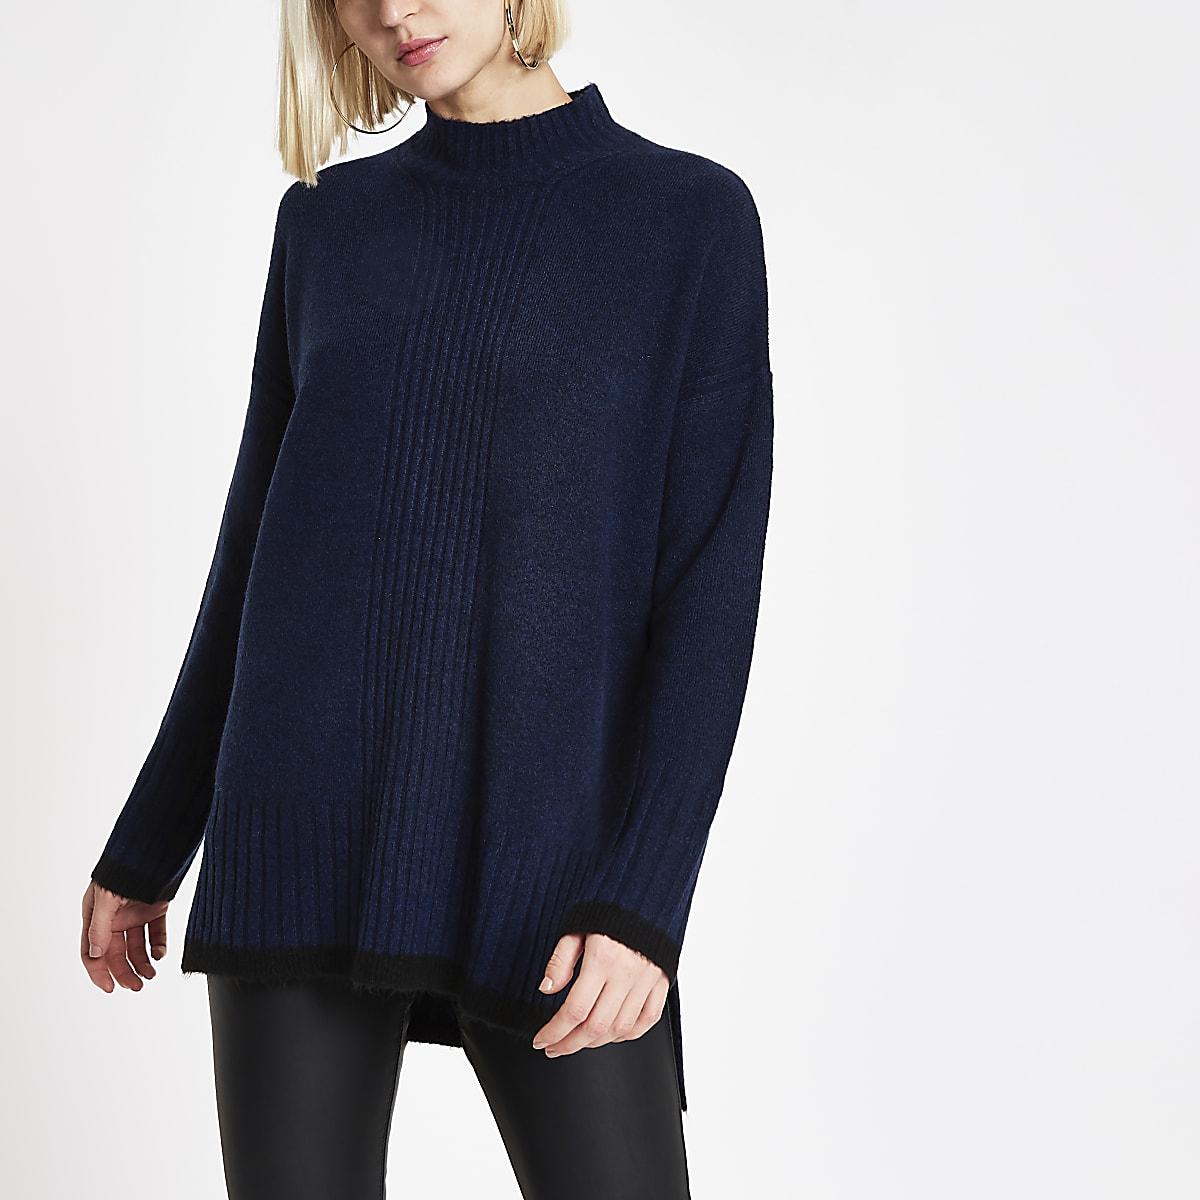 Navy knit split turtle neck sweater